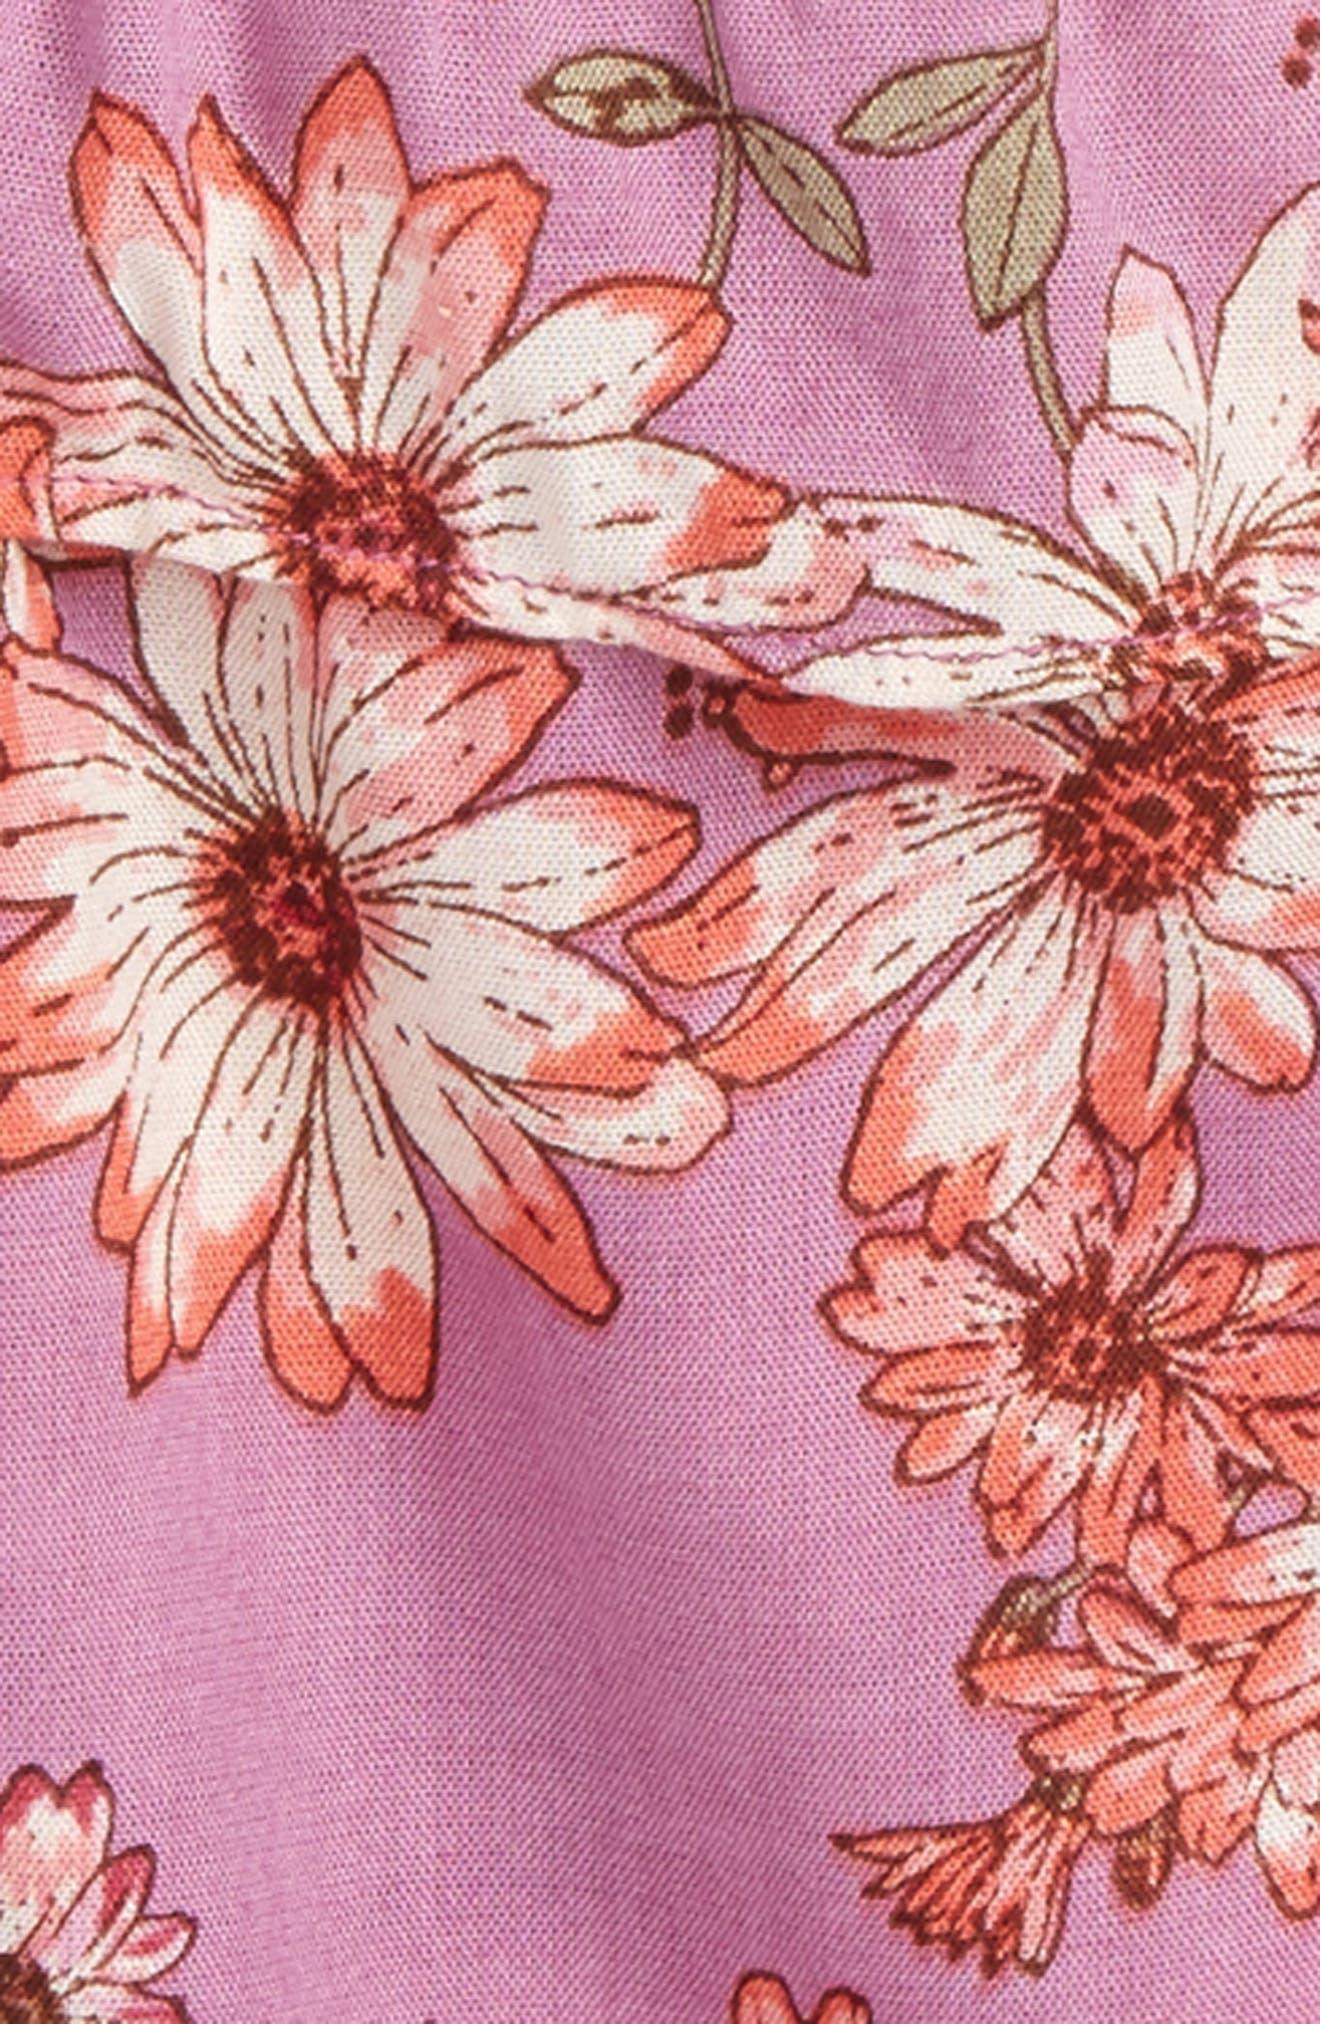 Hula Cold Shoulder Top,                             Alternate thumbnail 2, color,                             650